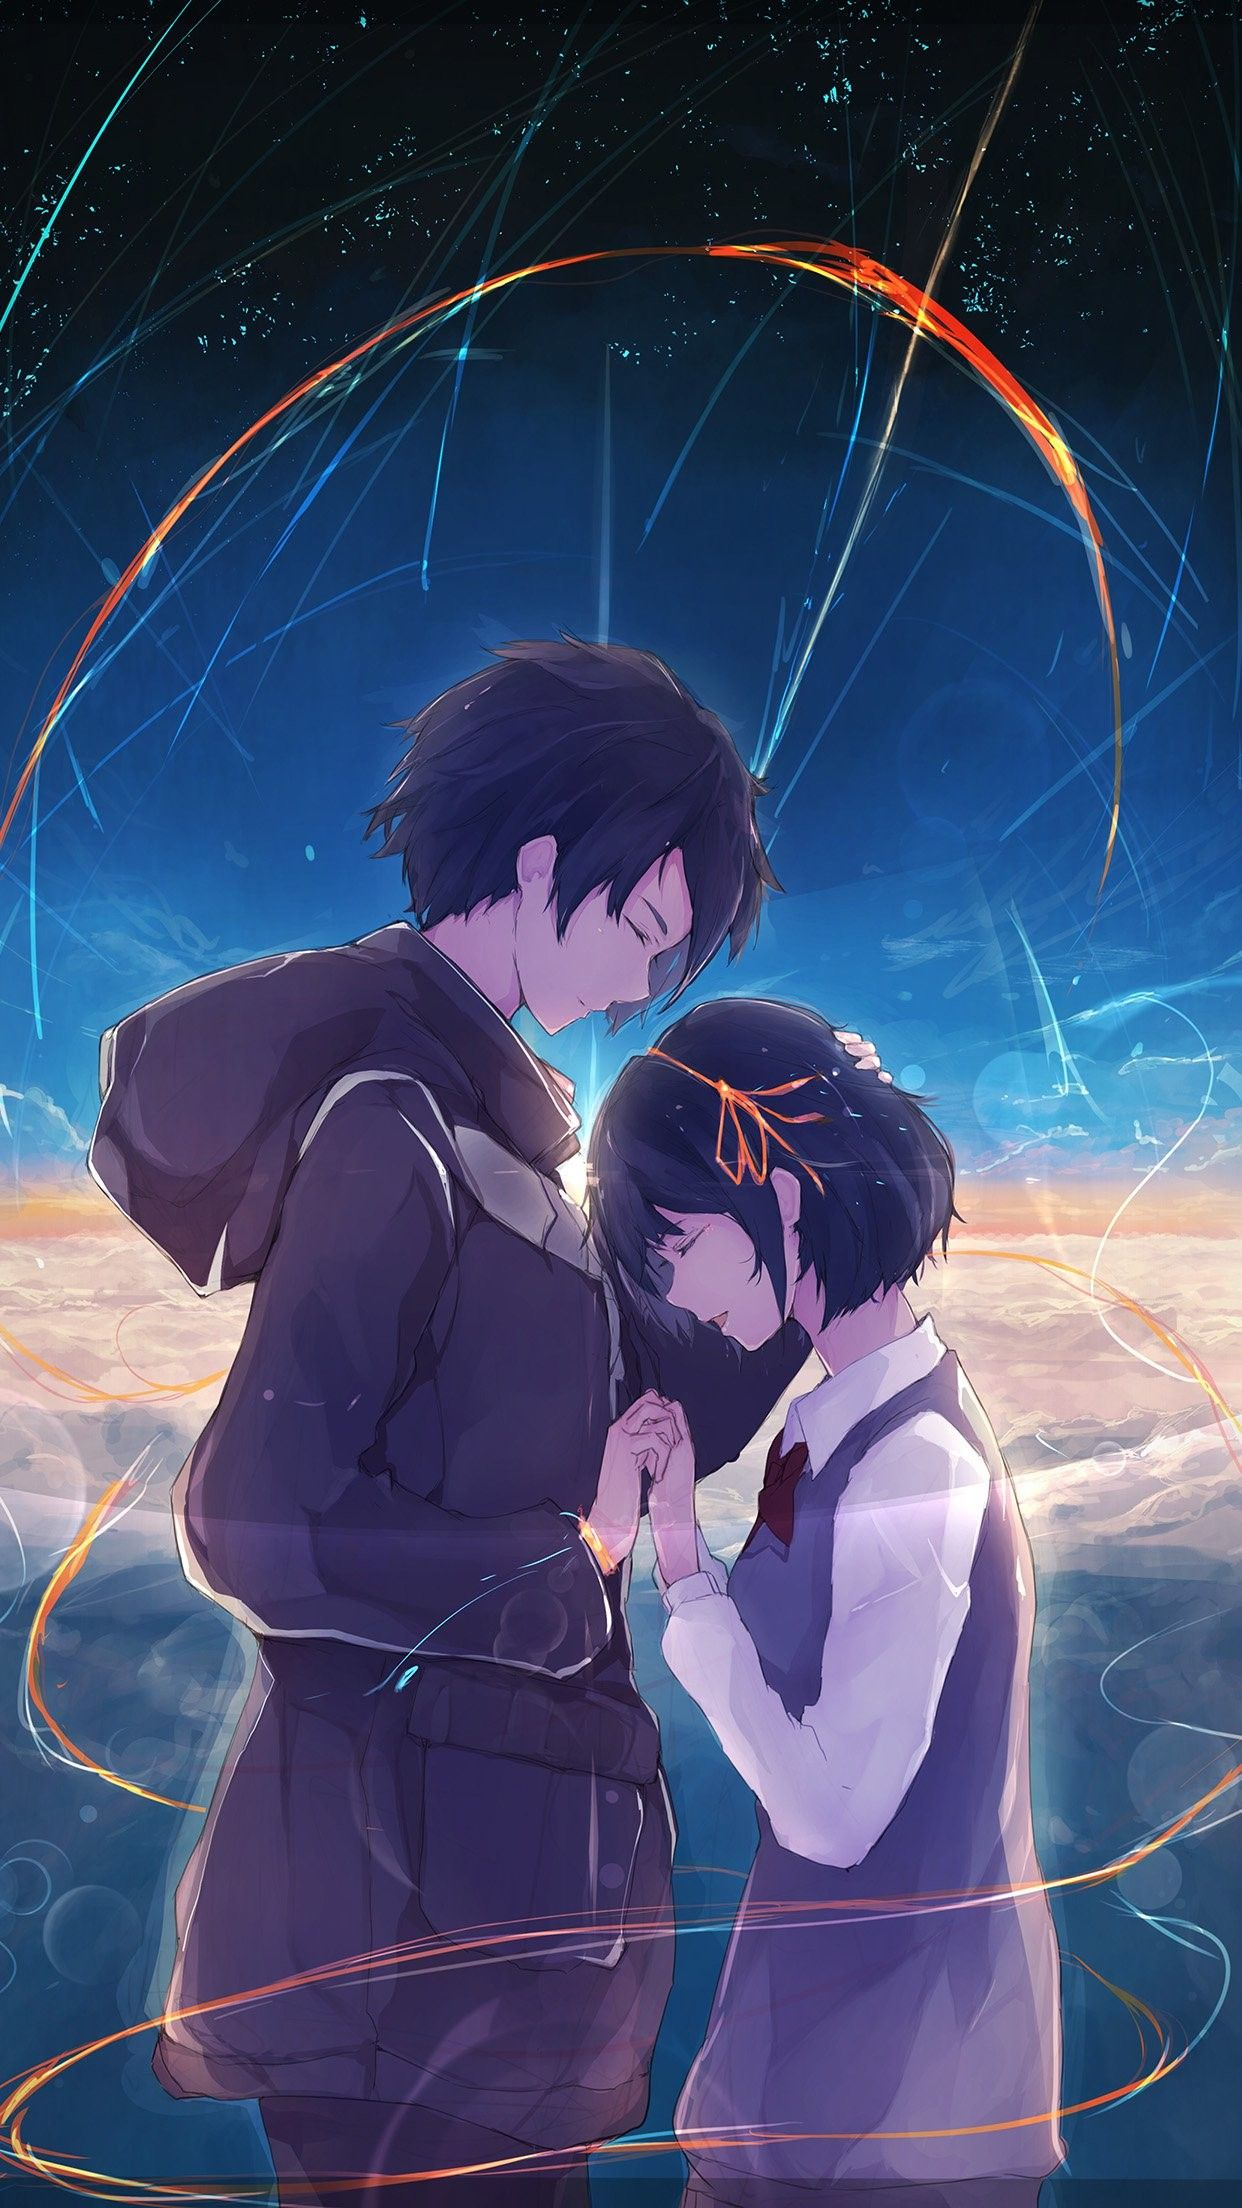 Visit Anime Shirt Club For Anime T Shirts Tanks And Hoodies Find Artistic And Unique Anime T Shirts Tanks And Ho Musik Anime Ilustrasi Karakter Cosplay Anime